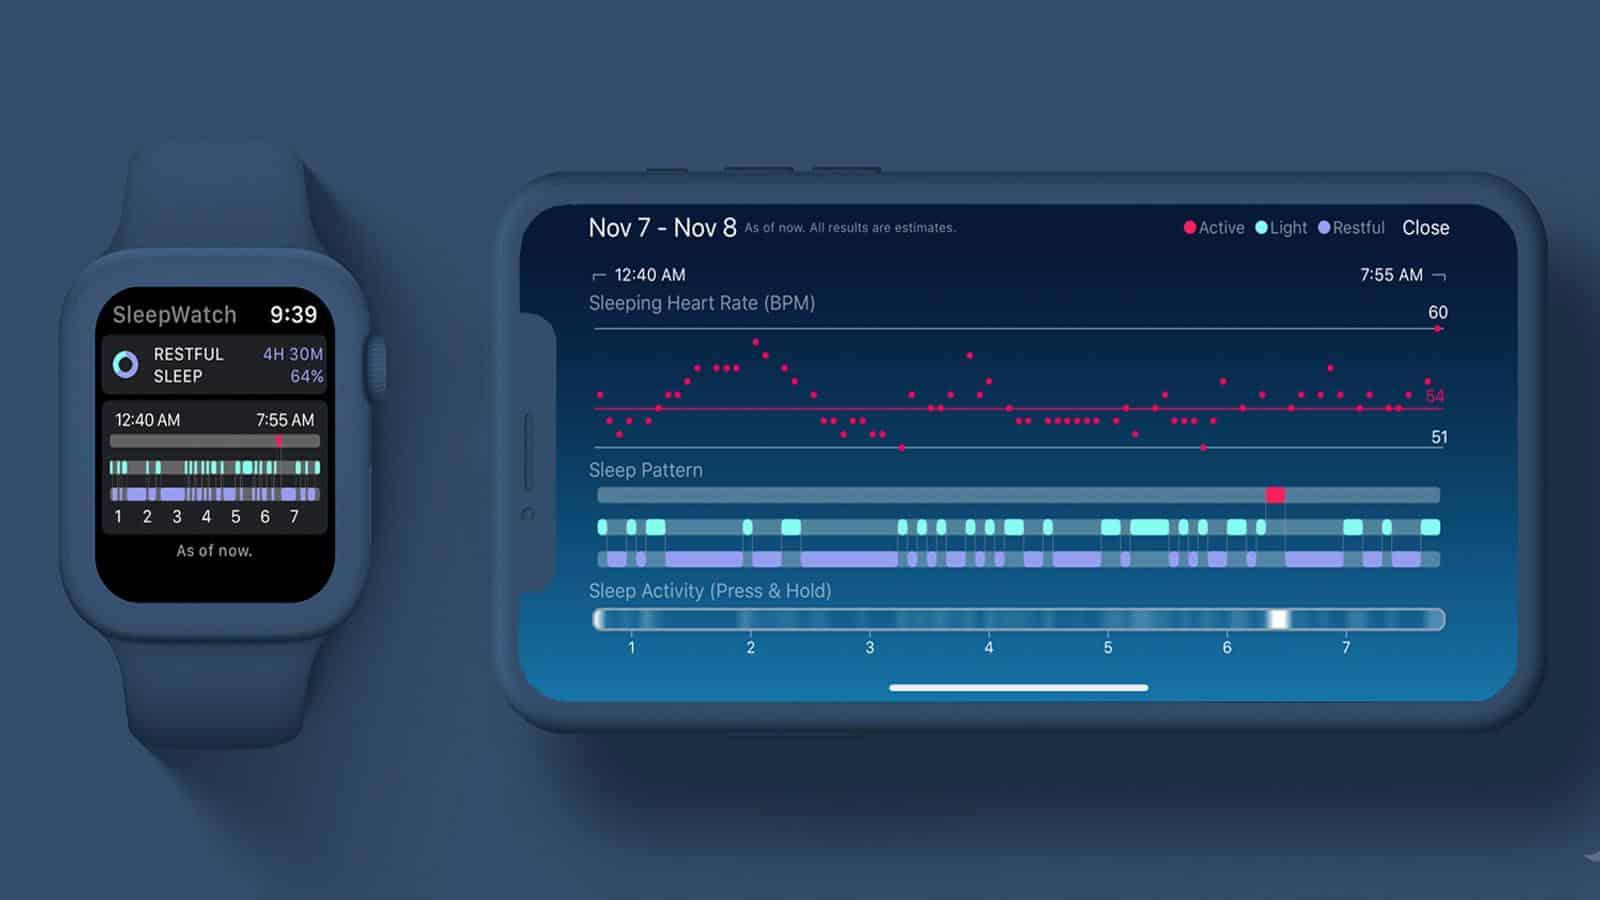 sleepwatch app on apple watch and iphone